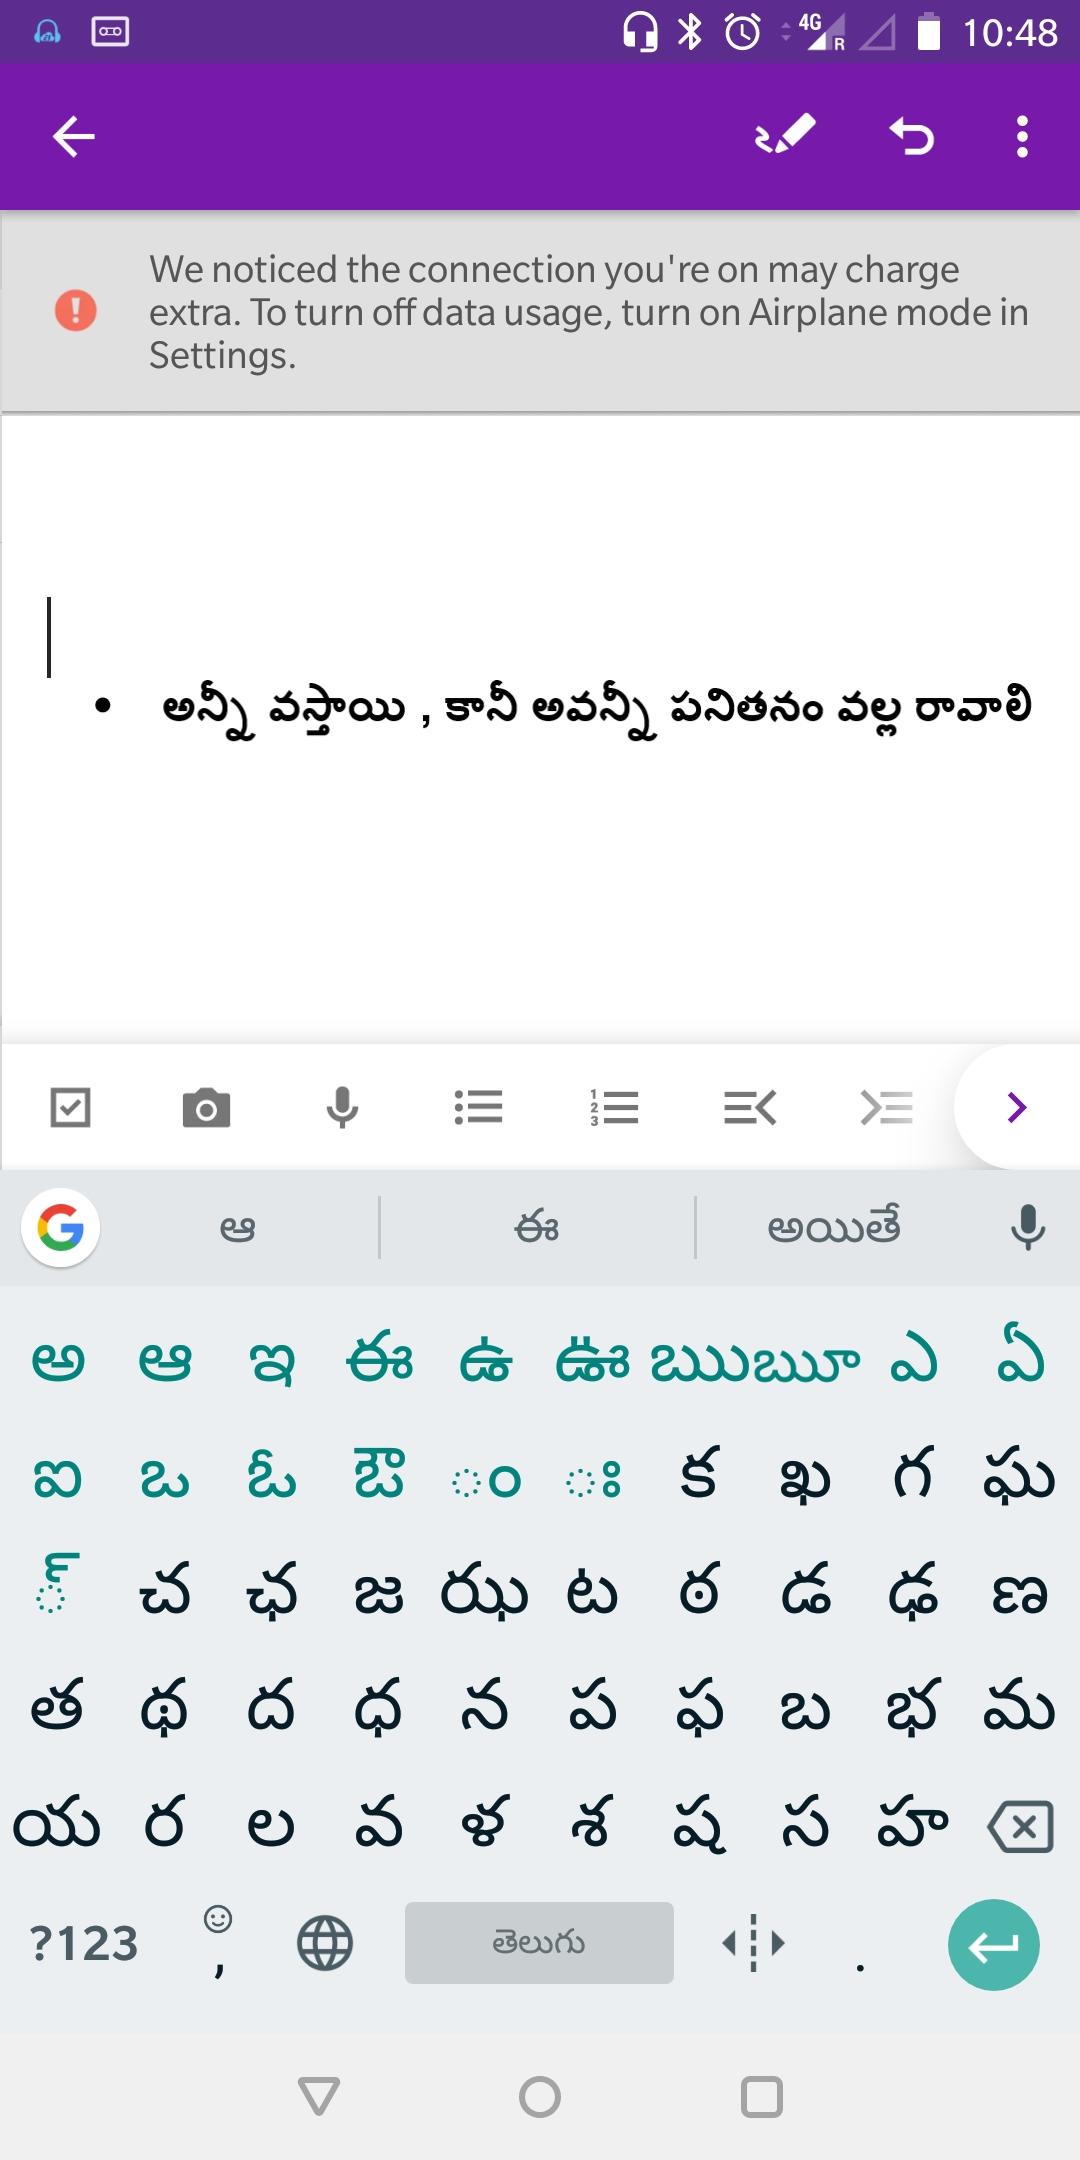 Android Onenote font issue with Telugu- English language change